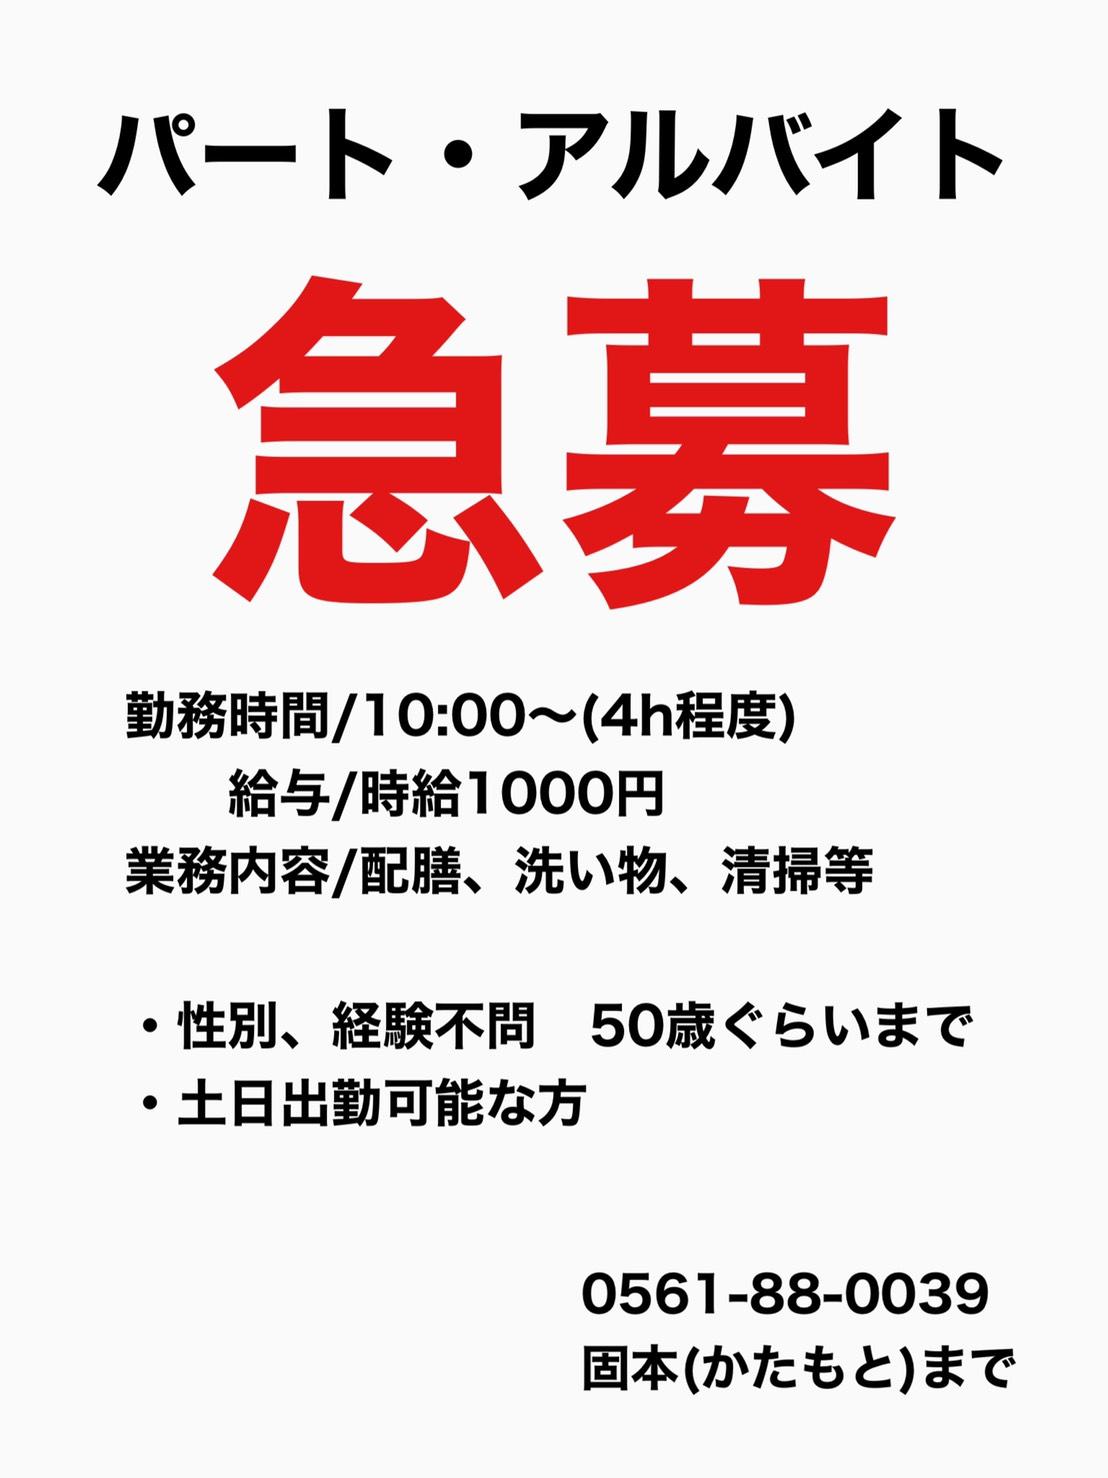 20201205092149cc6.jpg